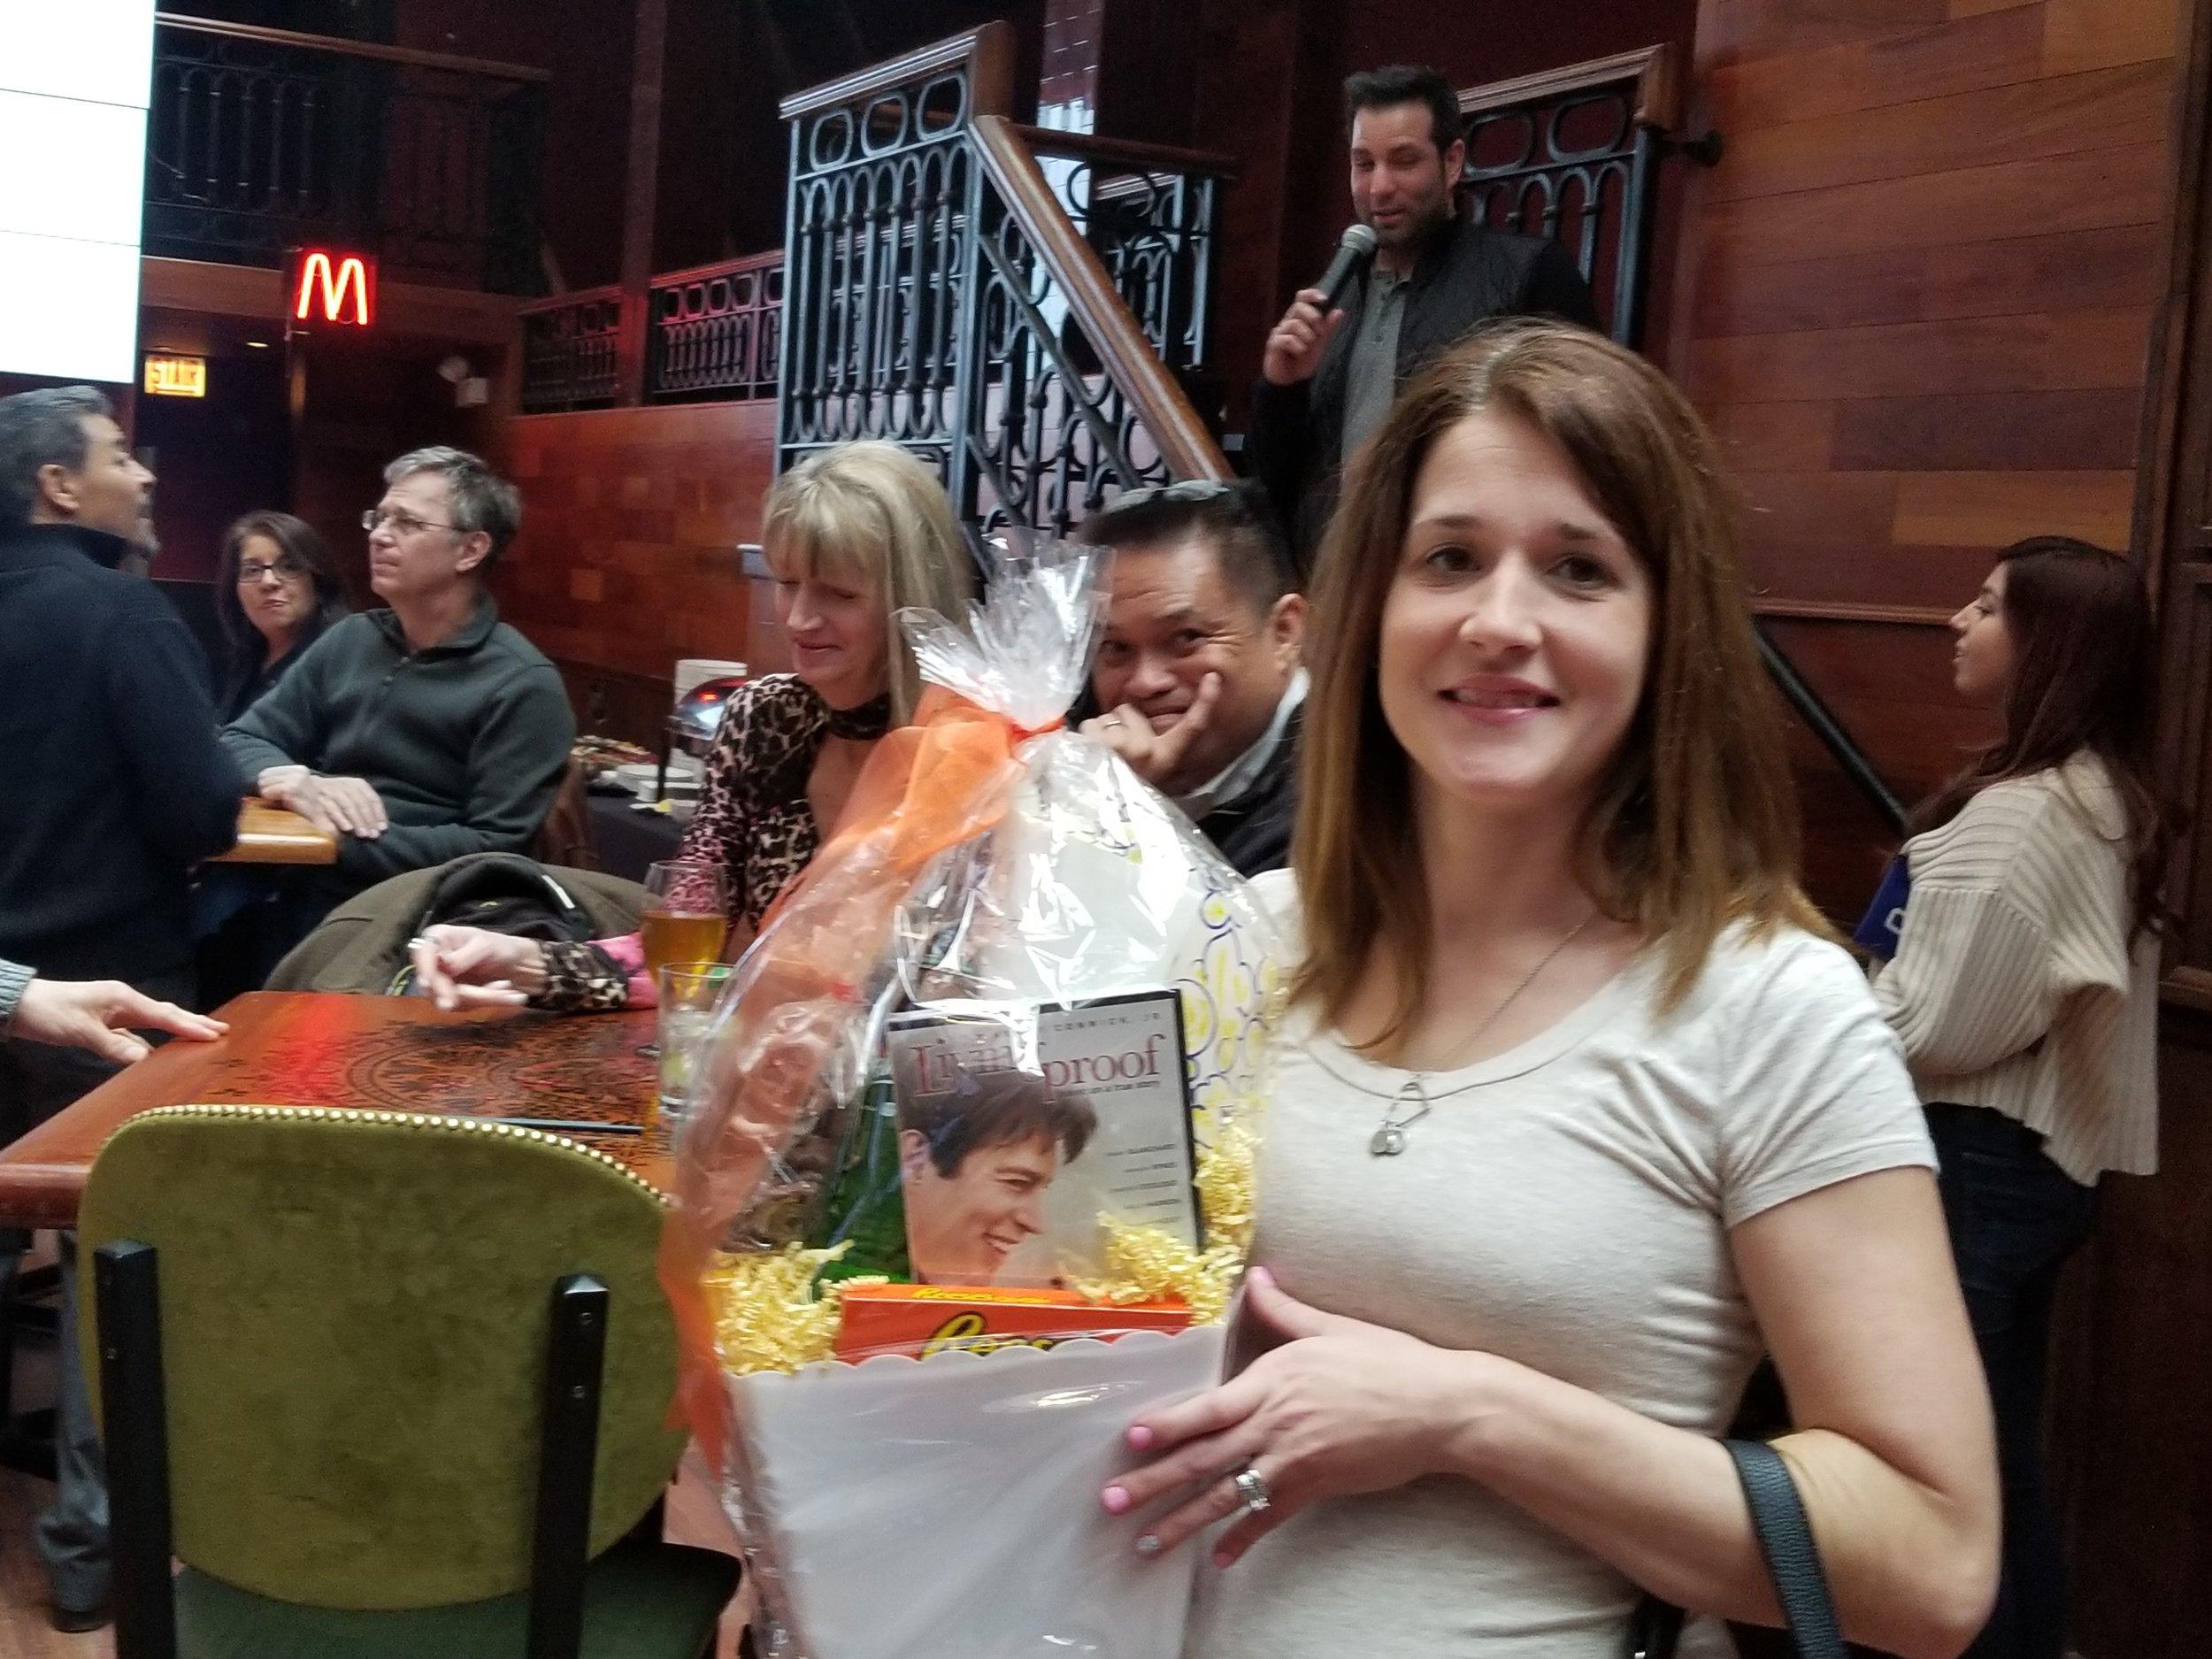 Lindsay_Kernel popcorn raffle winner 2018.jpg